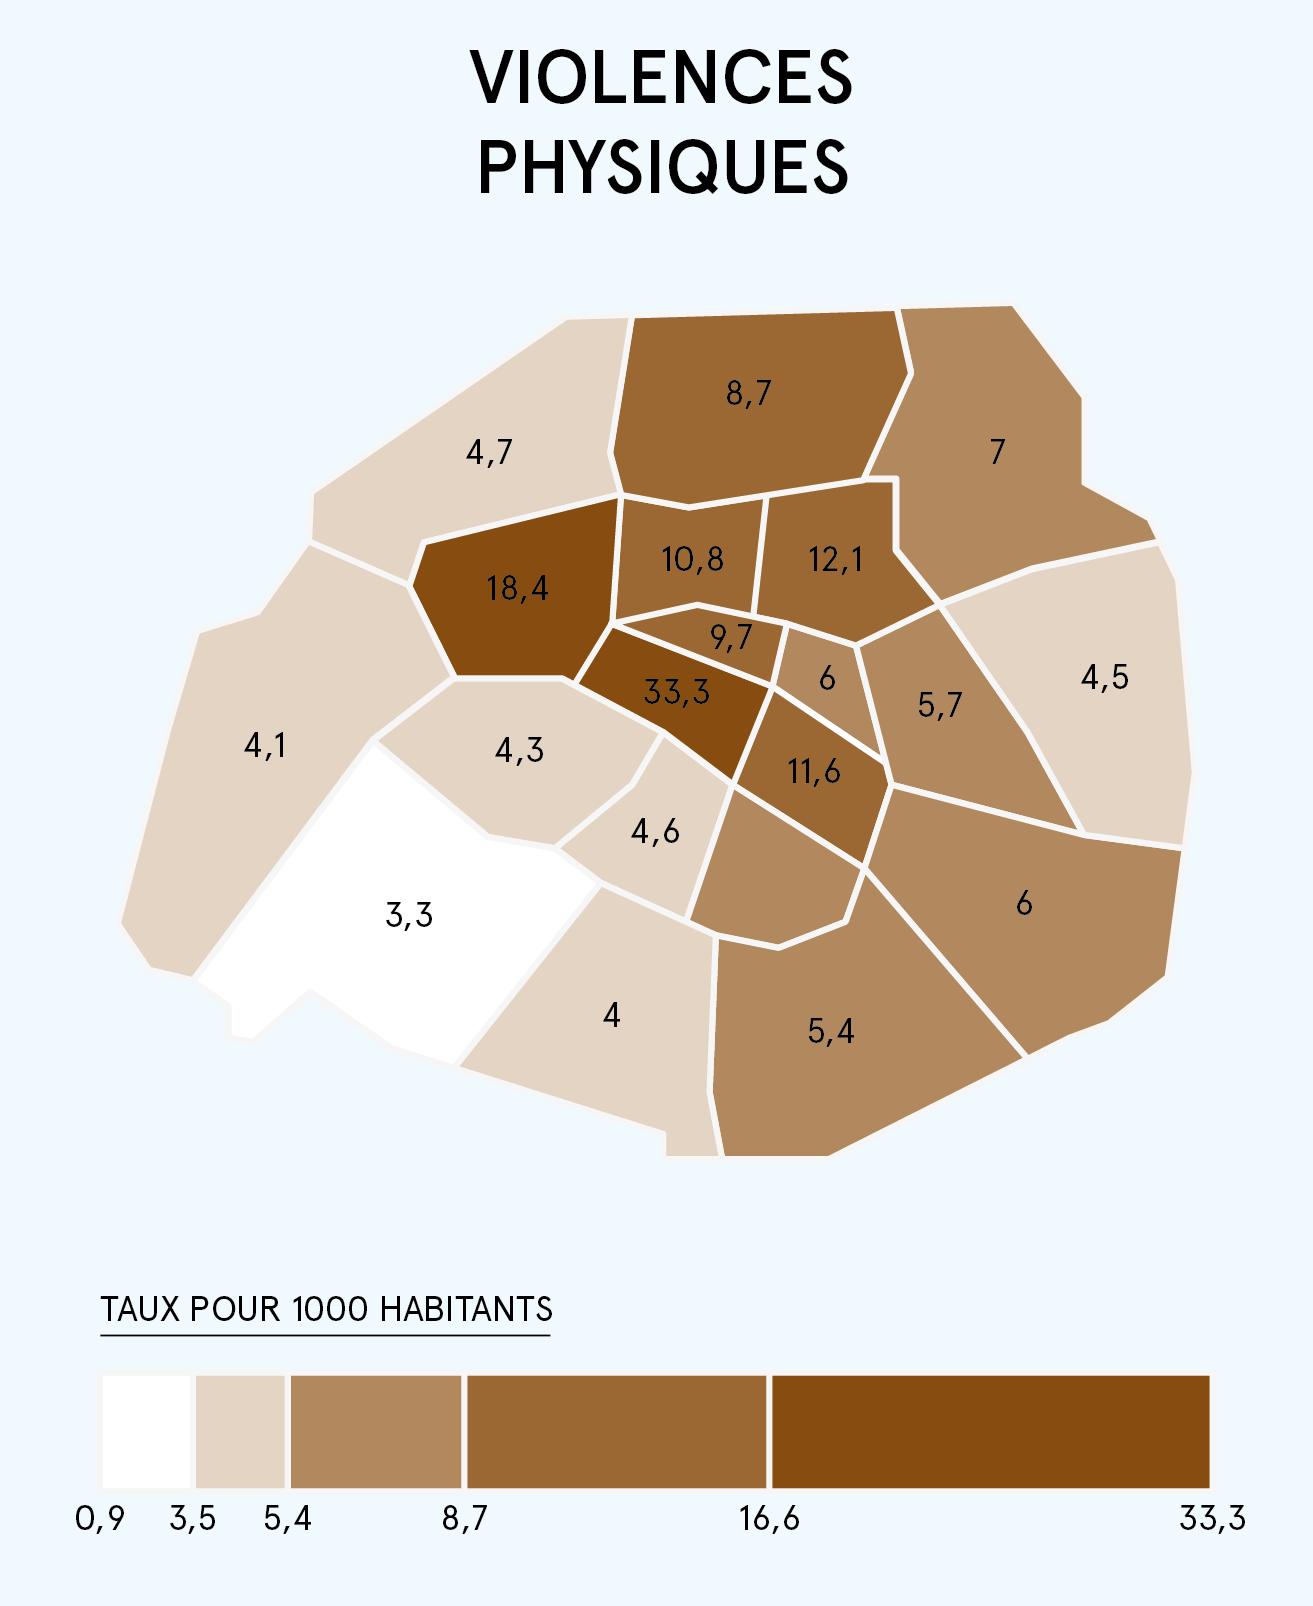 Paris crime rate 2018 - Paris Safety Tips - BonAdvisor on map of havana neighborhoods, map of worcester neighborhoods, map of frankfurt neighborhoods, map of st petersburg neighborhoods, map of sao paulo brazil neighborhoods, map of beaverton neighborhoods, map of kirkland neighborhoods, map of toulouse neighborhoods, map berlin neighborhoods, map of frisco neighborhoods, map of boca raton neighborhoods, map of luxembourg neighborhoods, map of shanghai neighborhoods, map of edinburgh neighborhoods, map of dubai neighborhoods, french neighborhoods, map of minneapolis st paul neighborhoods, map of salt lake city neighborhoods, map of akron neighborhoods, map of beijing neighborhoods,